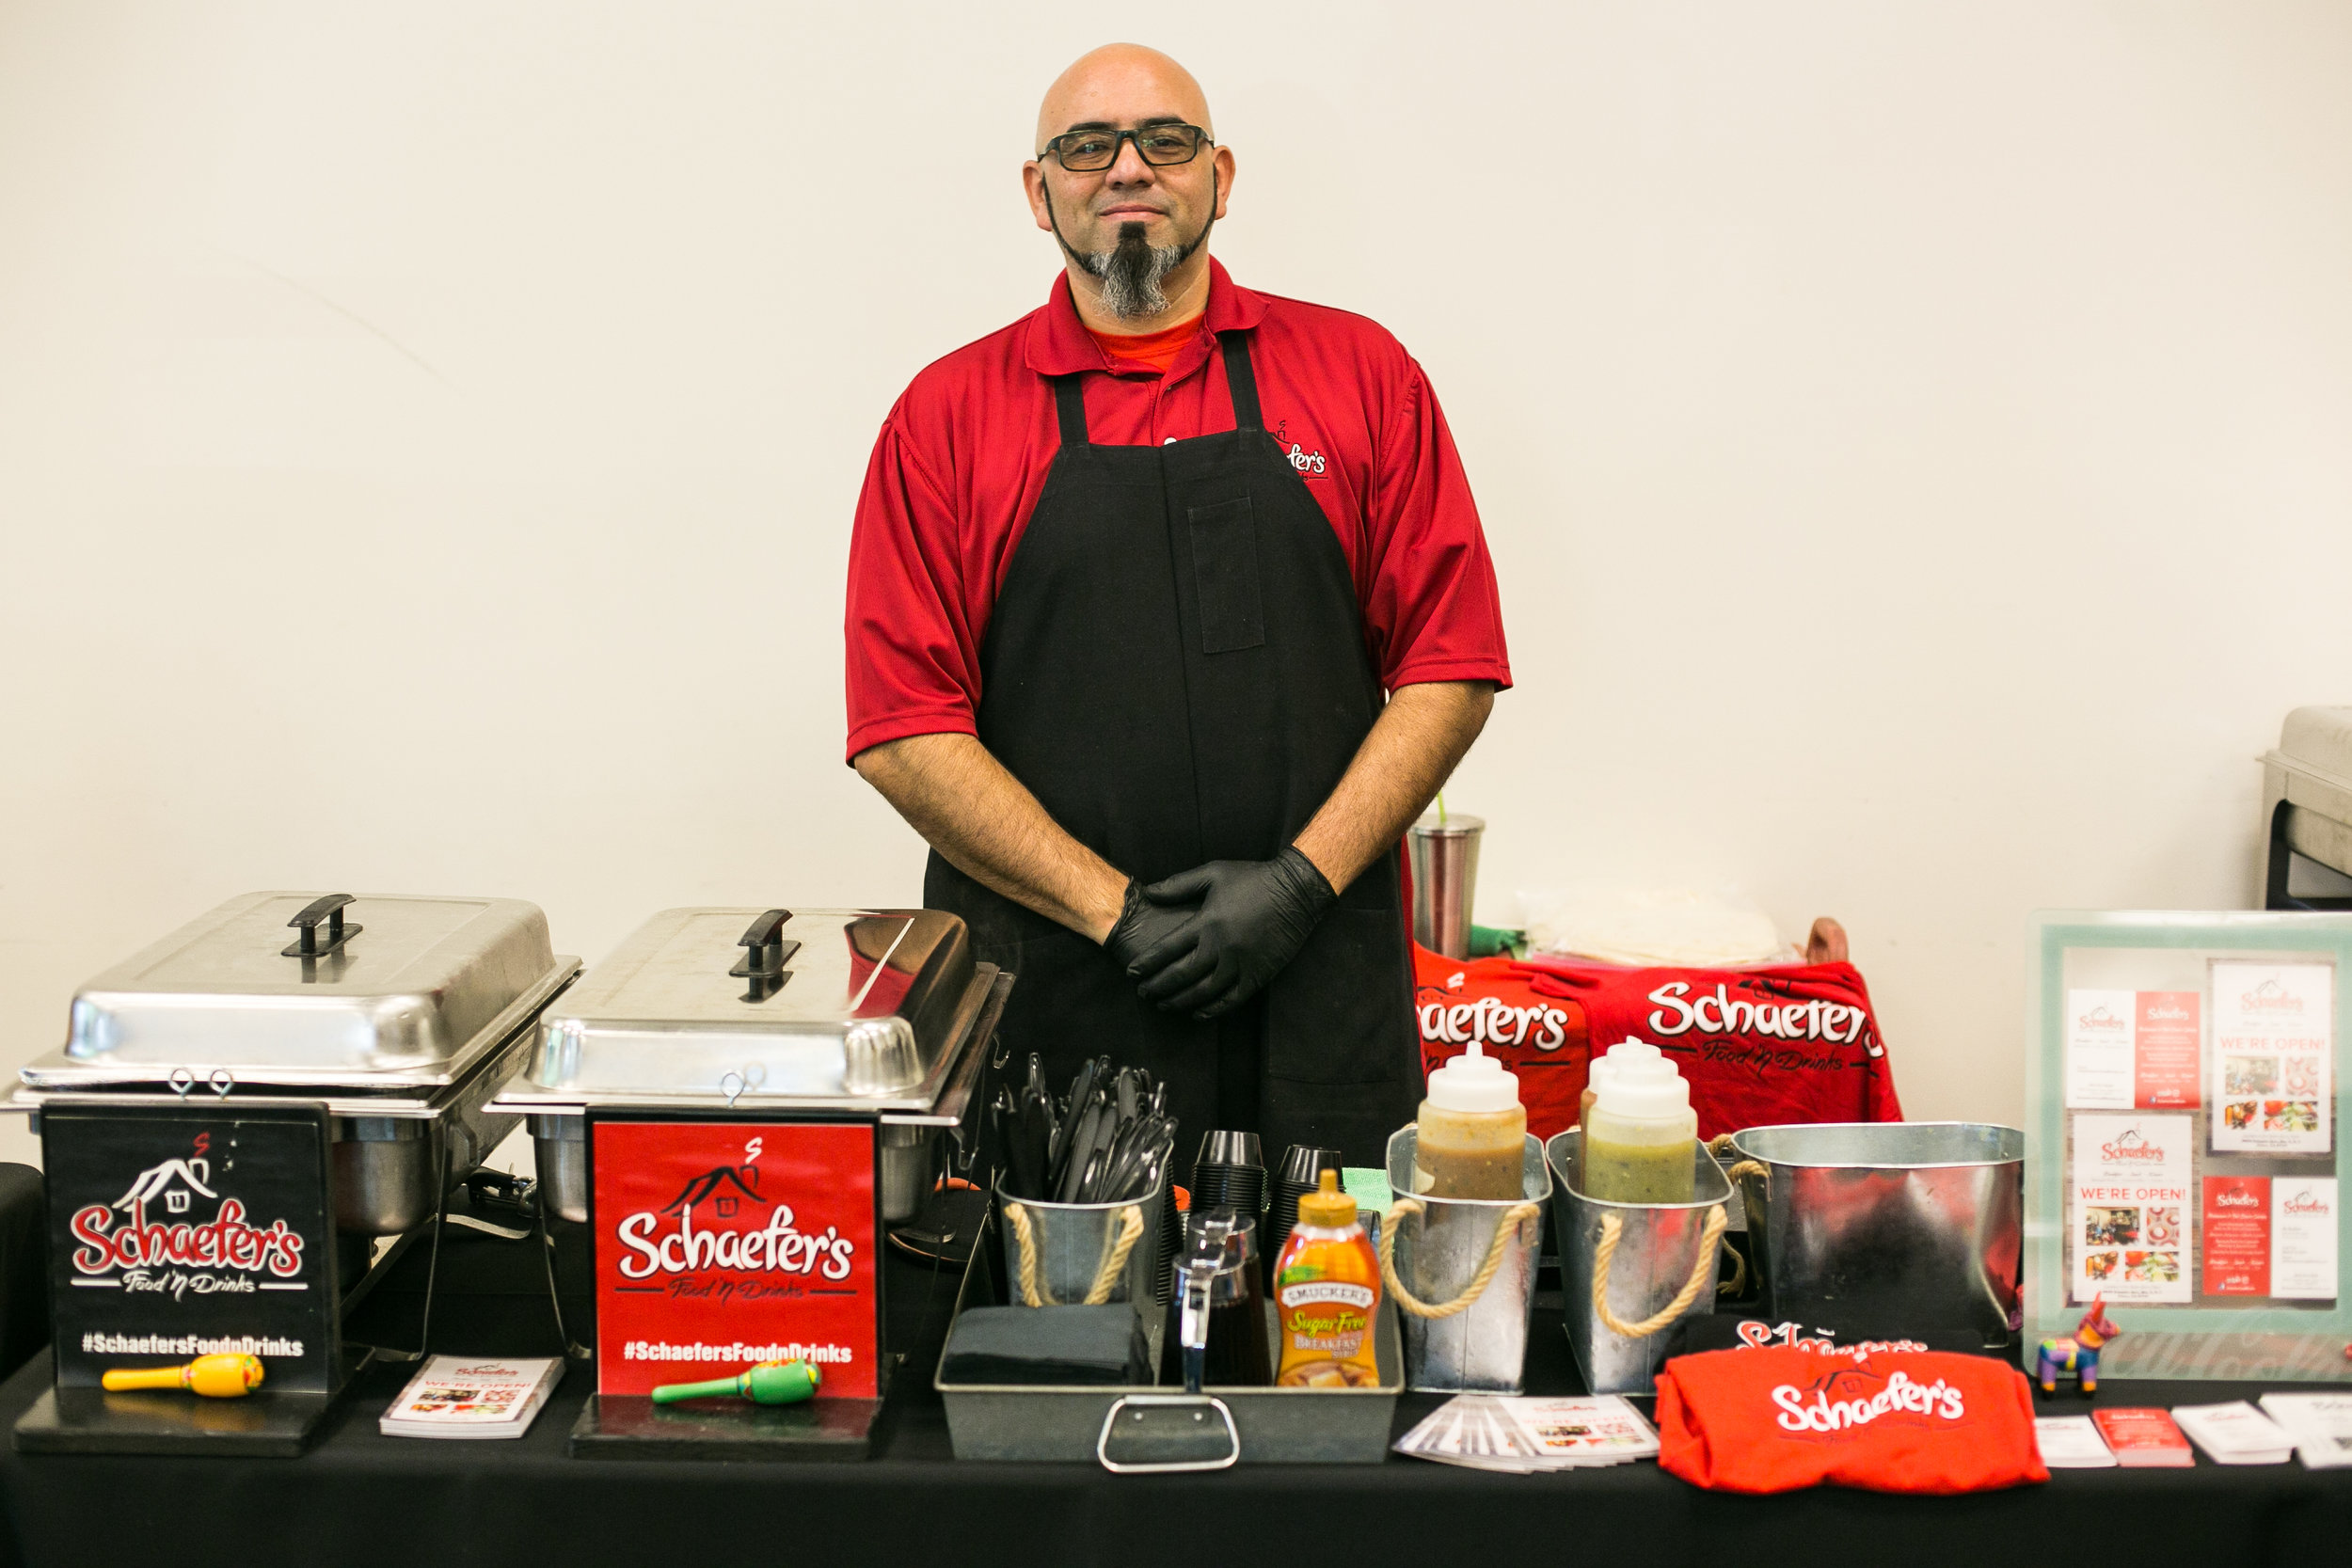 Schaefer's Food 'N Drinks